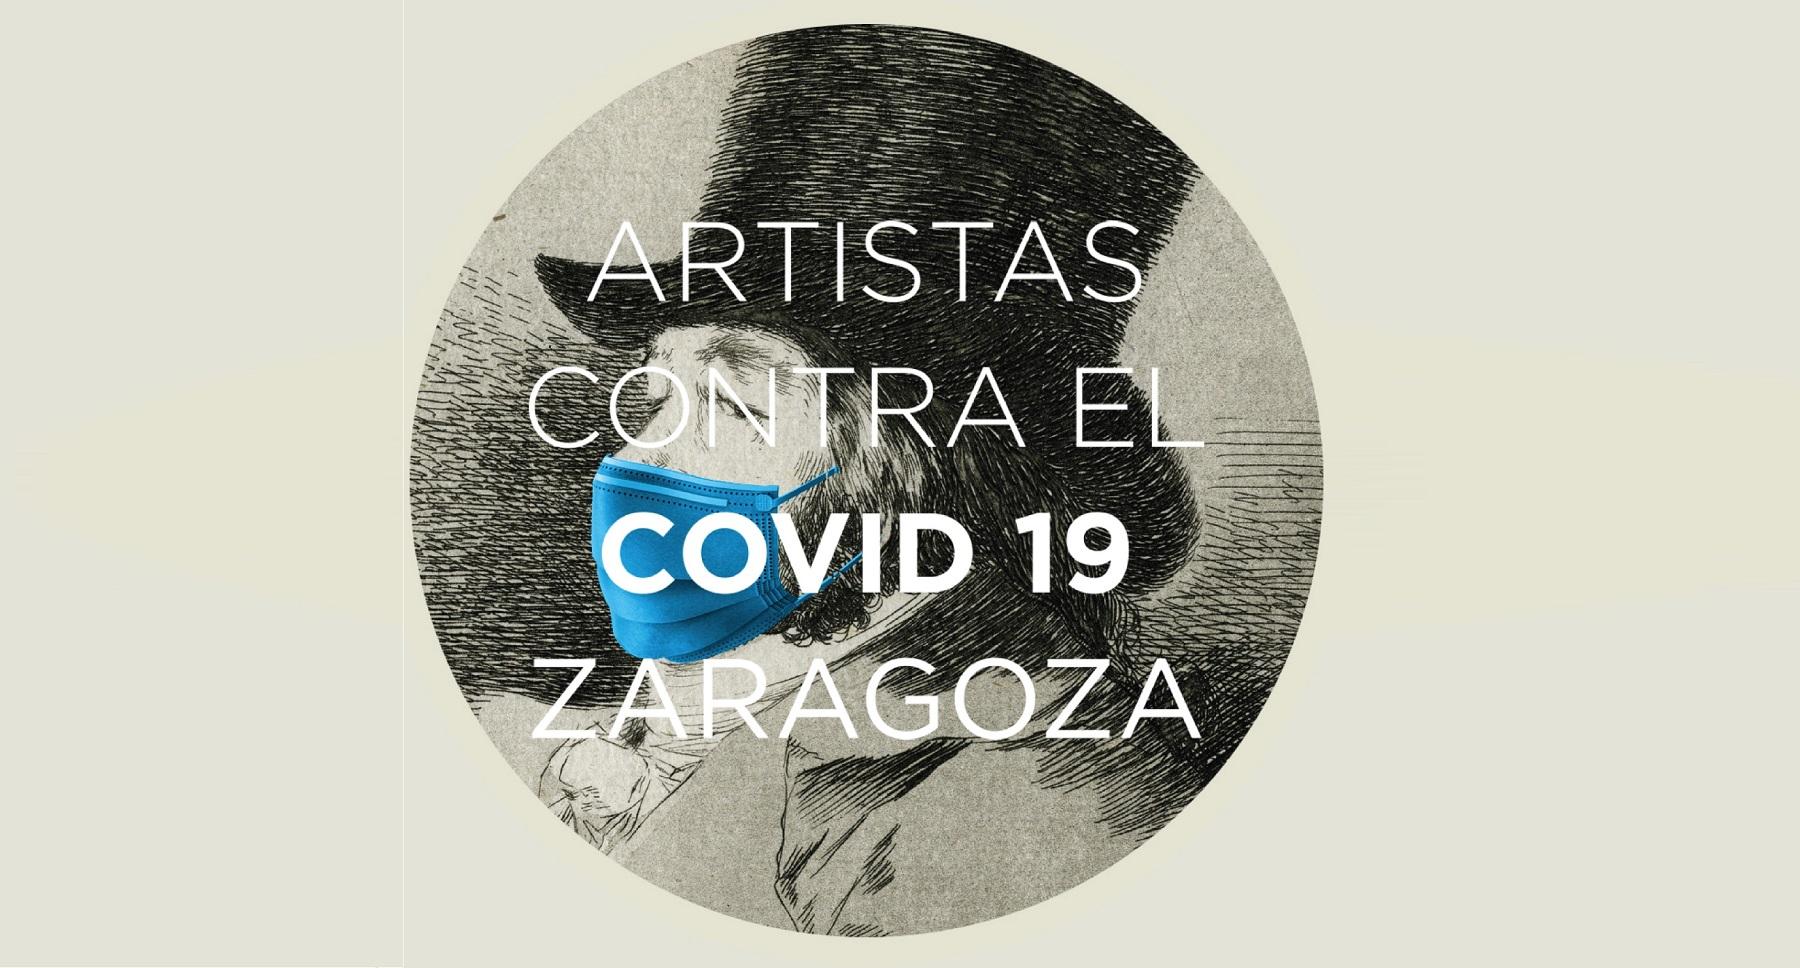 artistas contra covid zaragoza